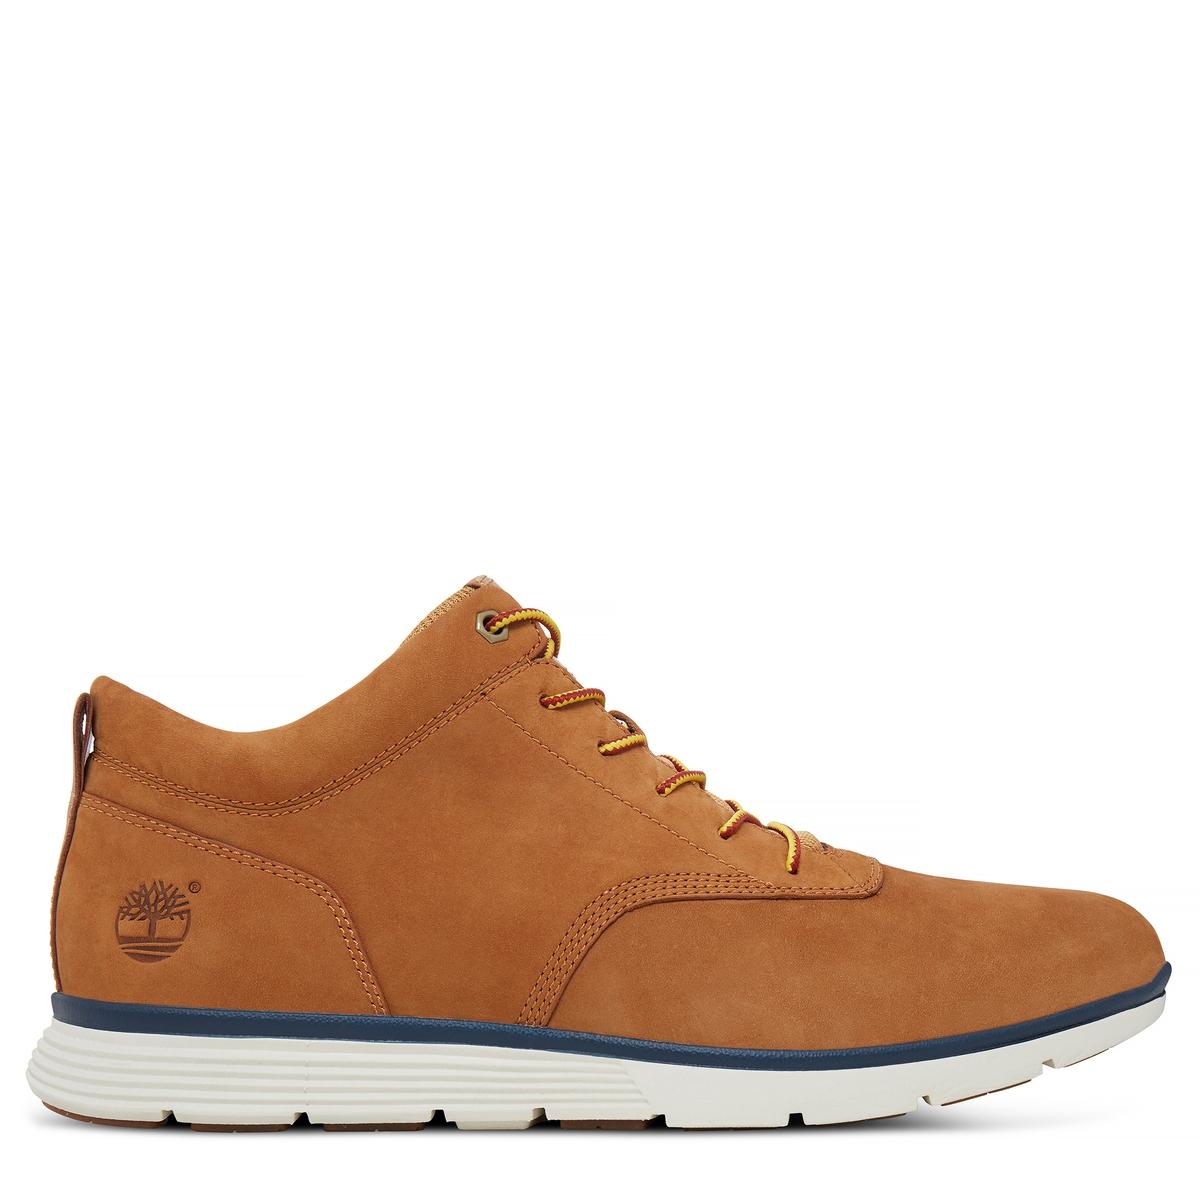 Zapatillas deportivas de piel Killington